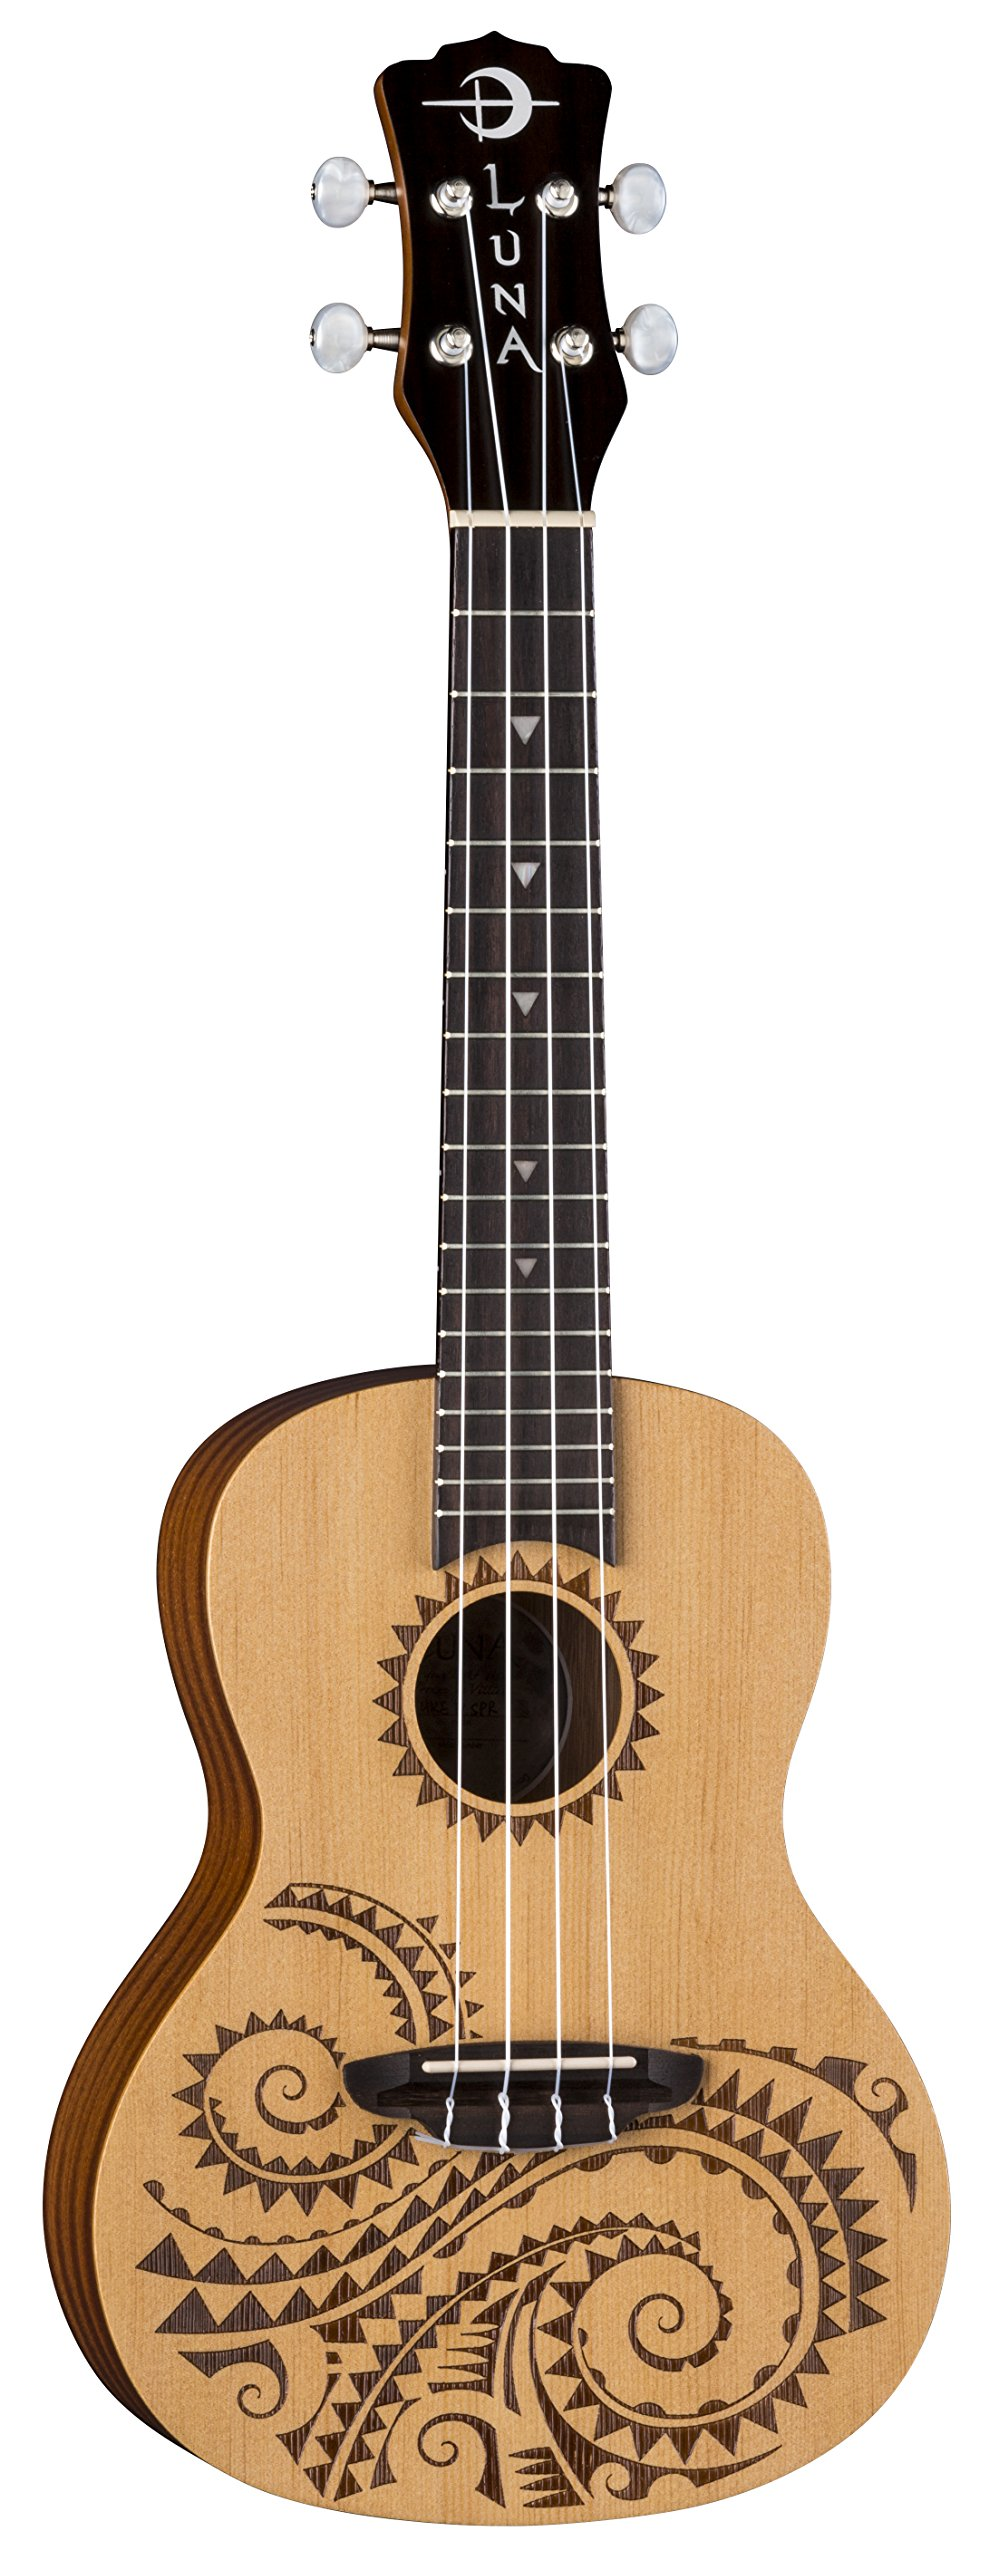 Luna Guitars UKETCSPR Tattoo Concert Spruce Ukulele w/Gig Bag